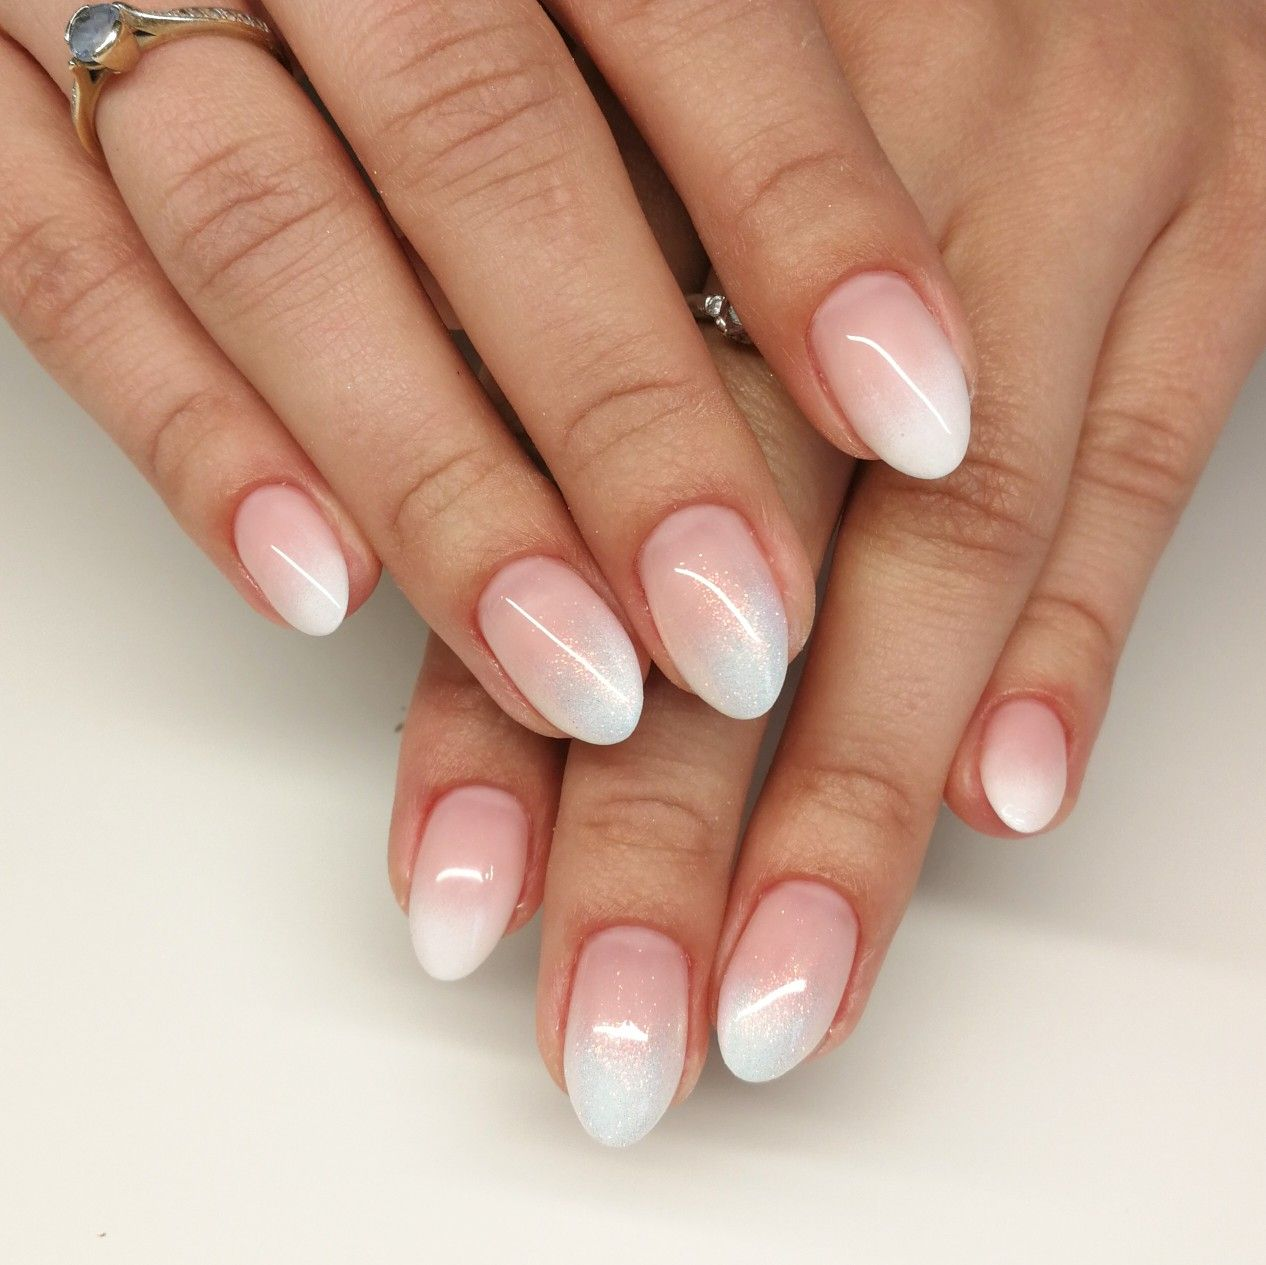 Ig Mini Mani Makeup Nails Paznokcie Hybryda Hybrydy Semilac Mani